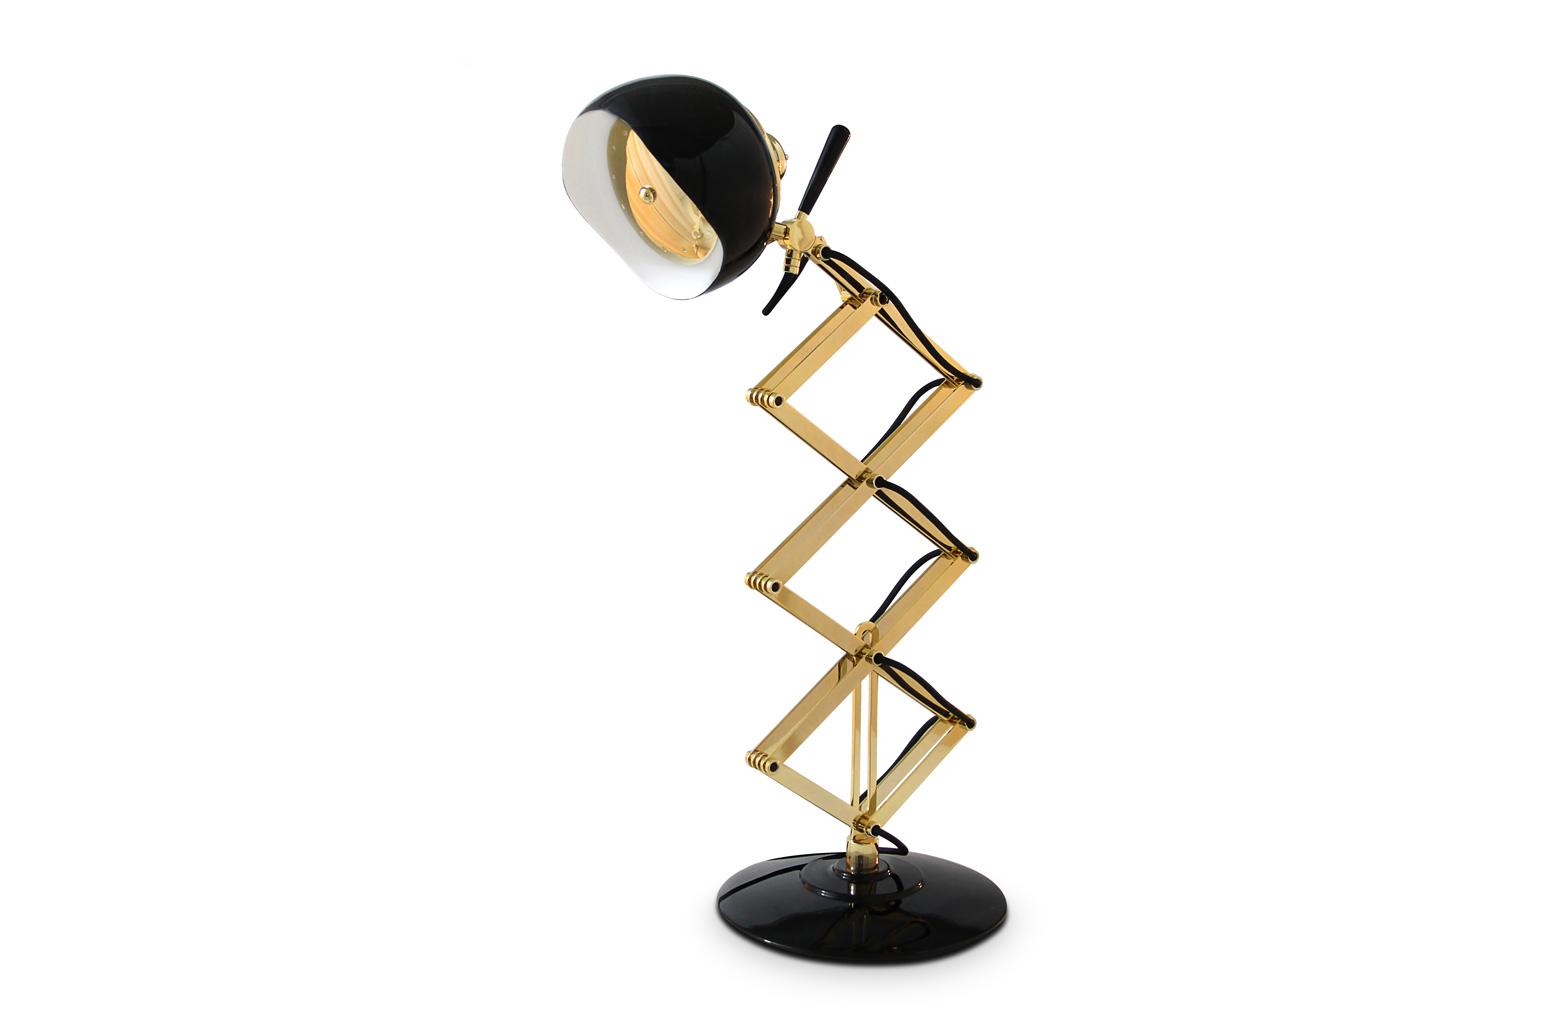 Table lamp adjustable - Fun Desk Lamps Hostgarcia U2013 Fun Desk Lamps